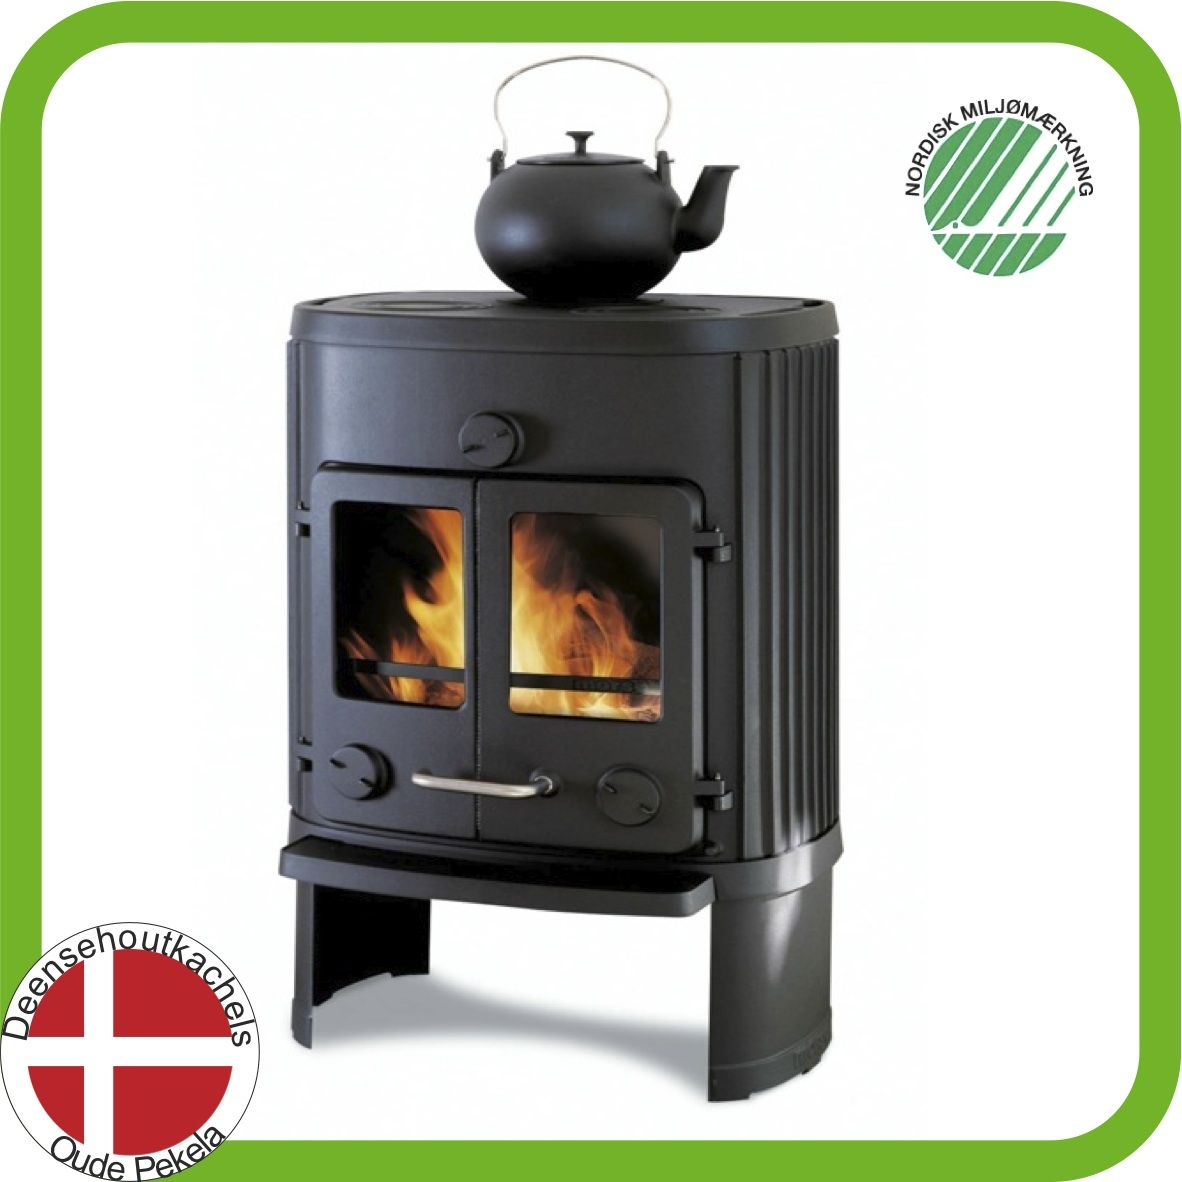 Classic cast-iron Morsø 1126 wood stove. | Morso wood stoves ...